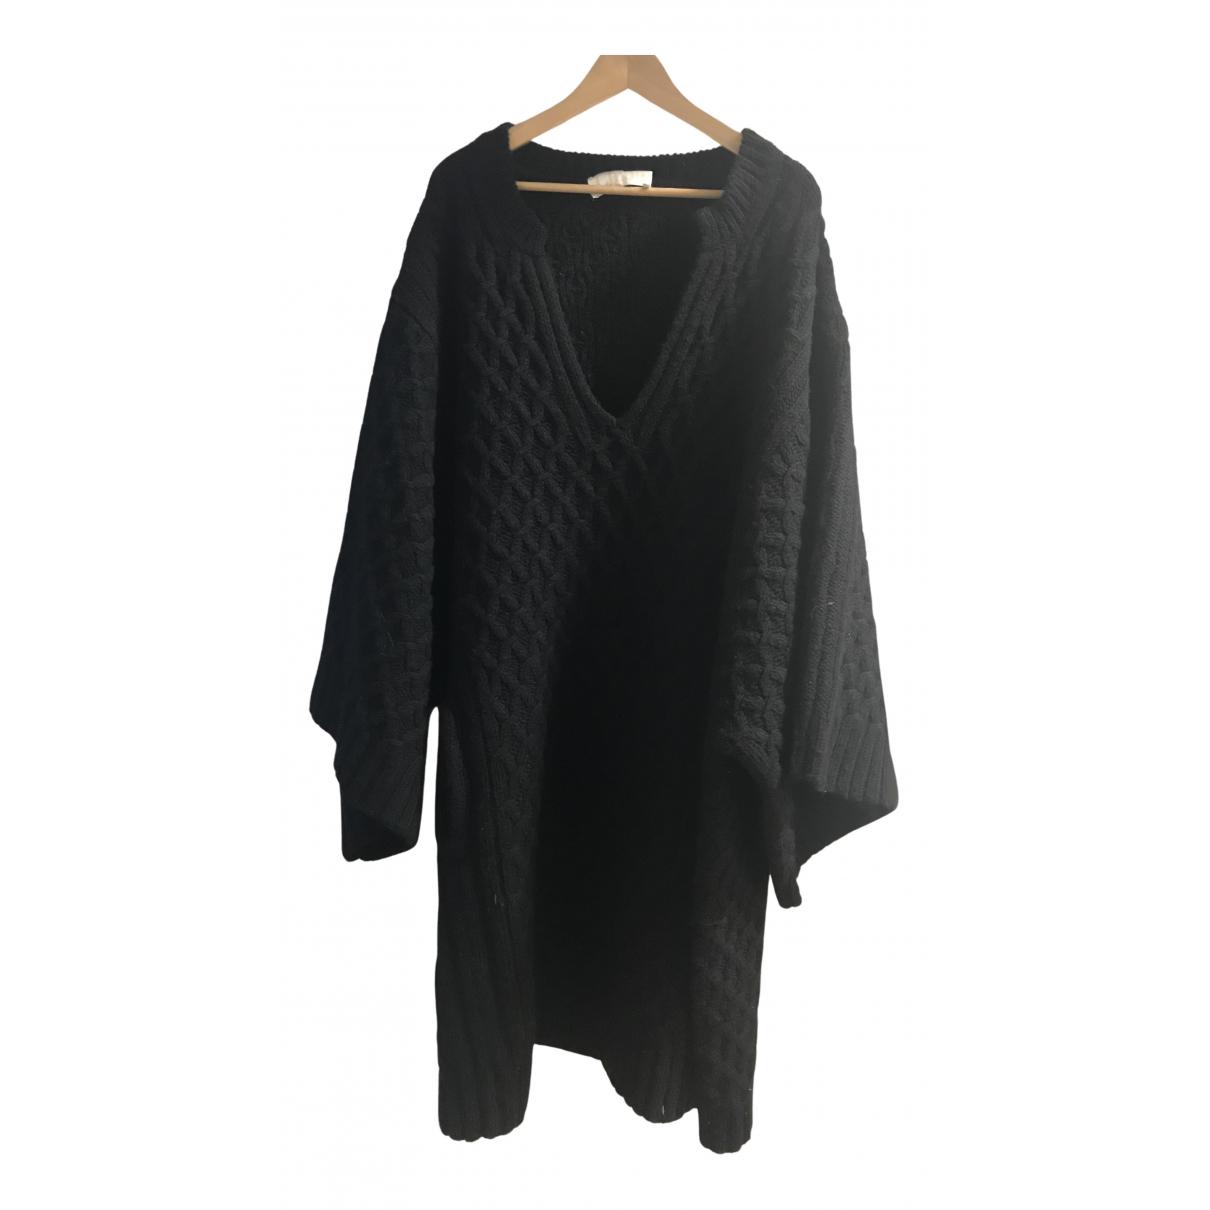 Chloe \N Pullover in  Schwarz Wolle